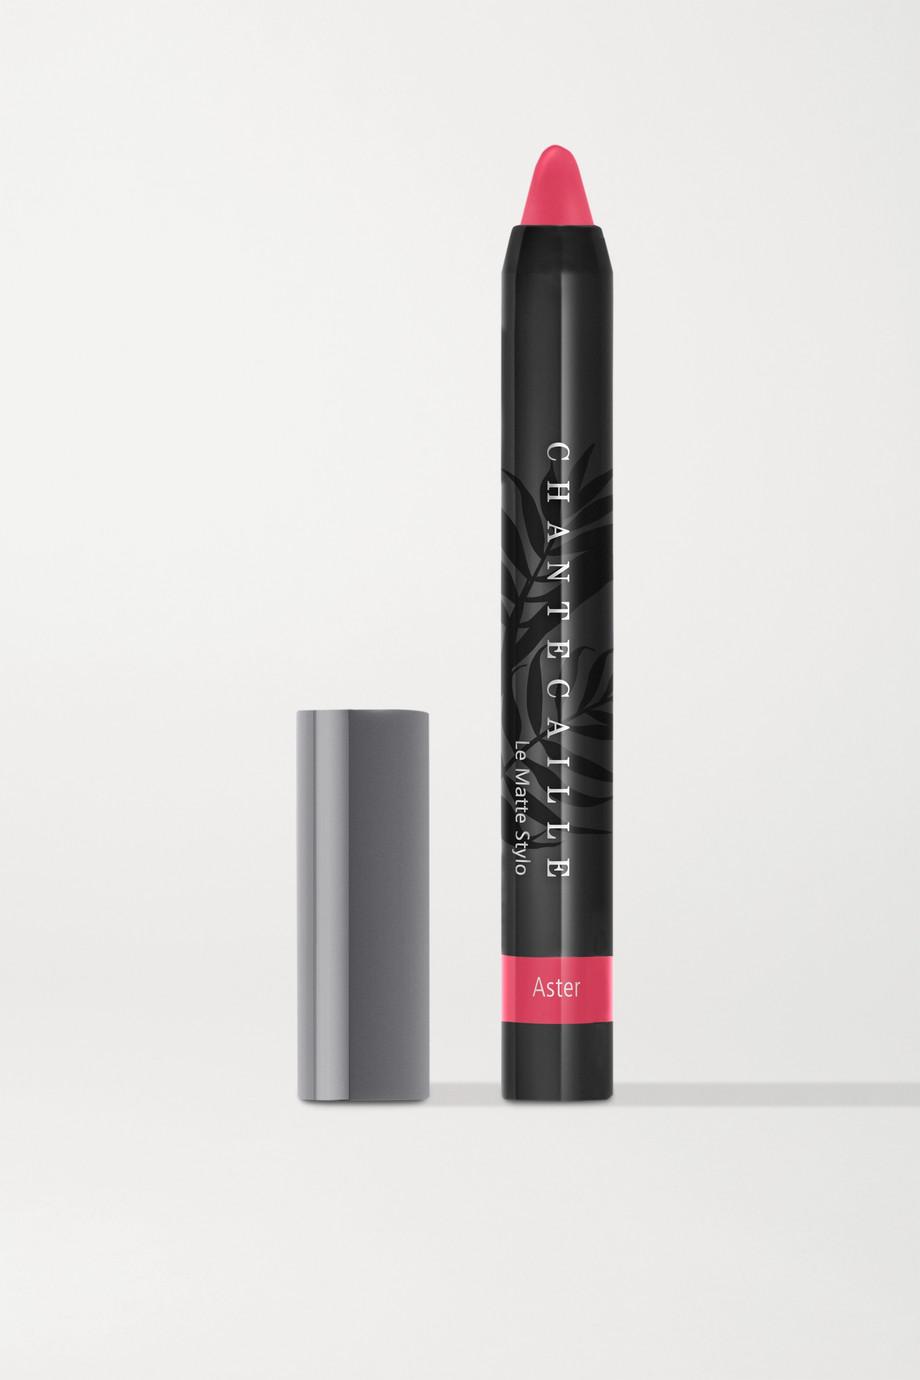 Chantecaille Le Matte Stylo Lip Crayon - Aster